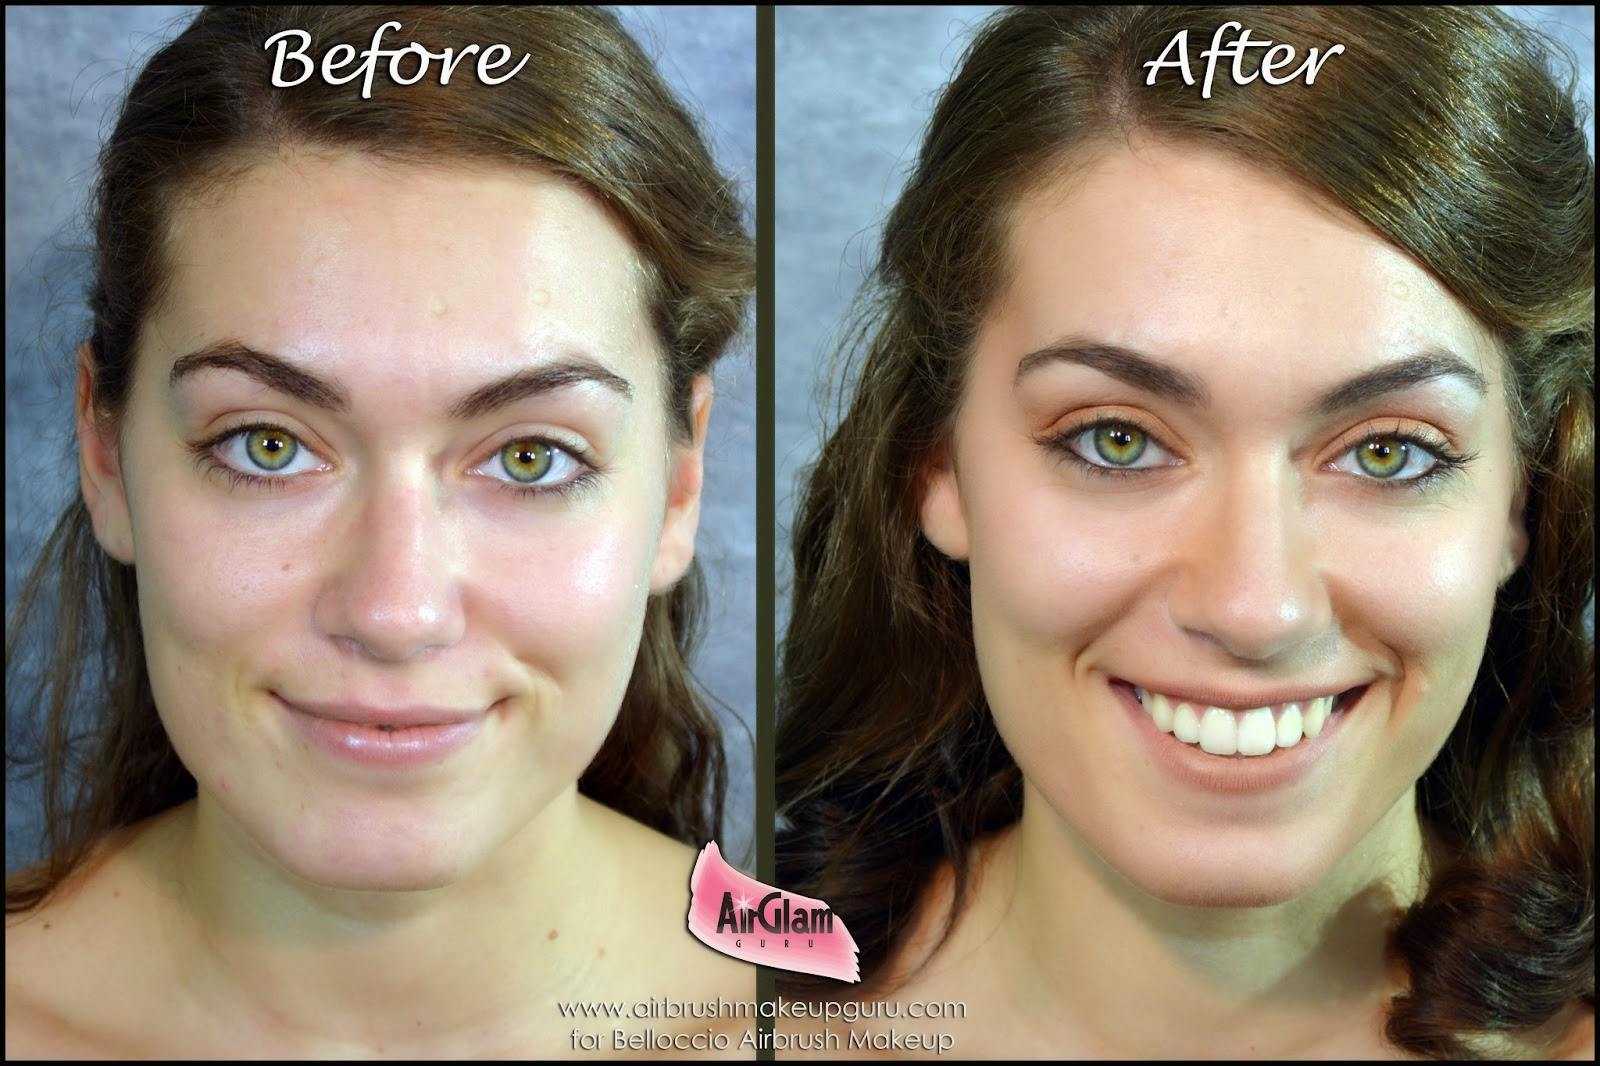 the airbrush makeup guru: airbrush maekup kit review and video